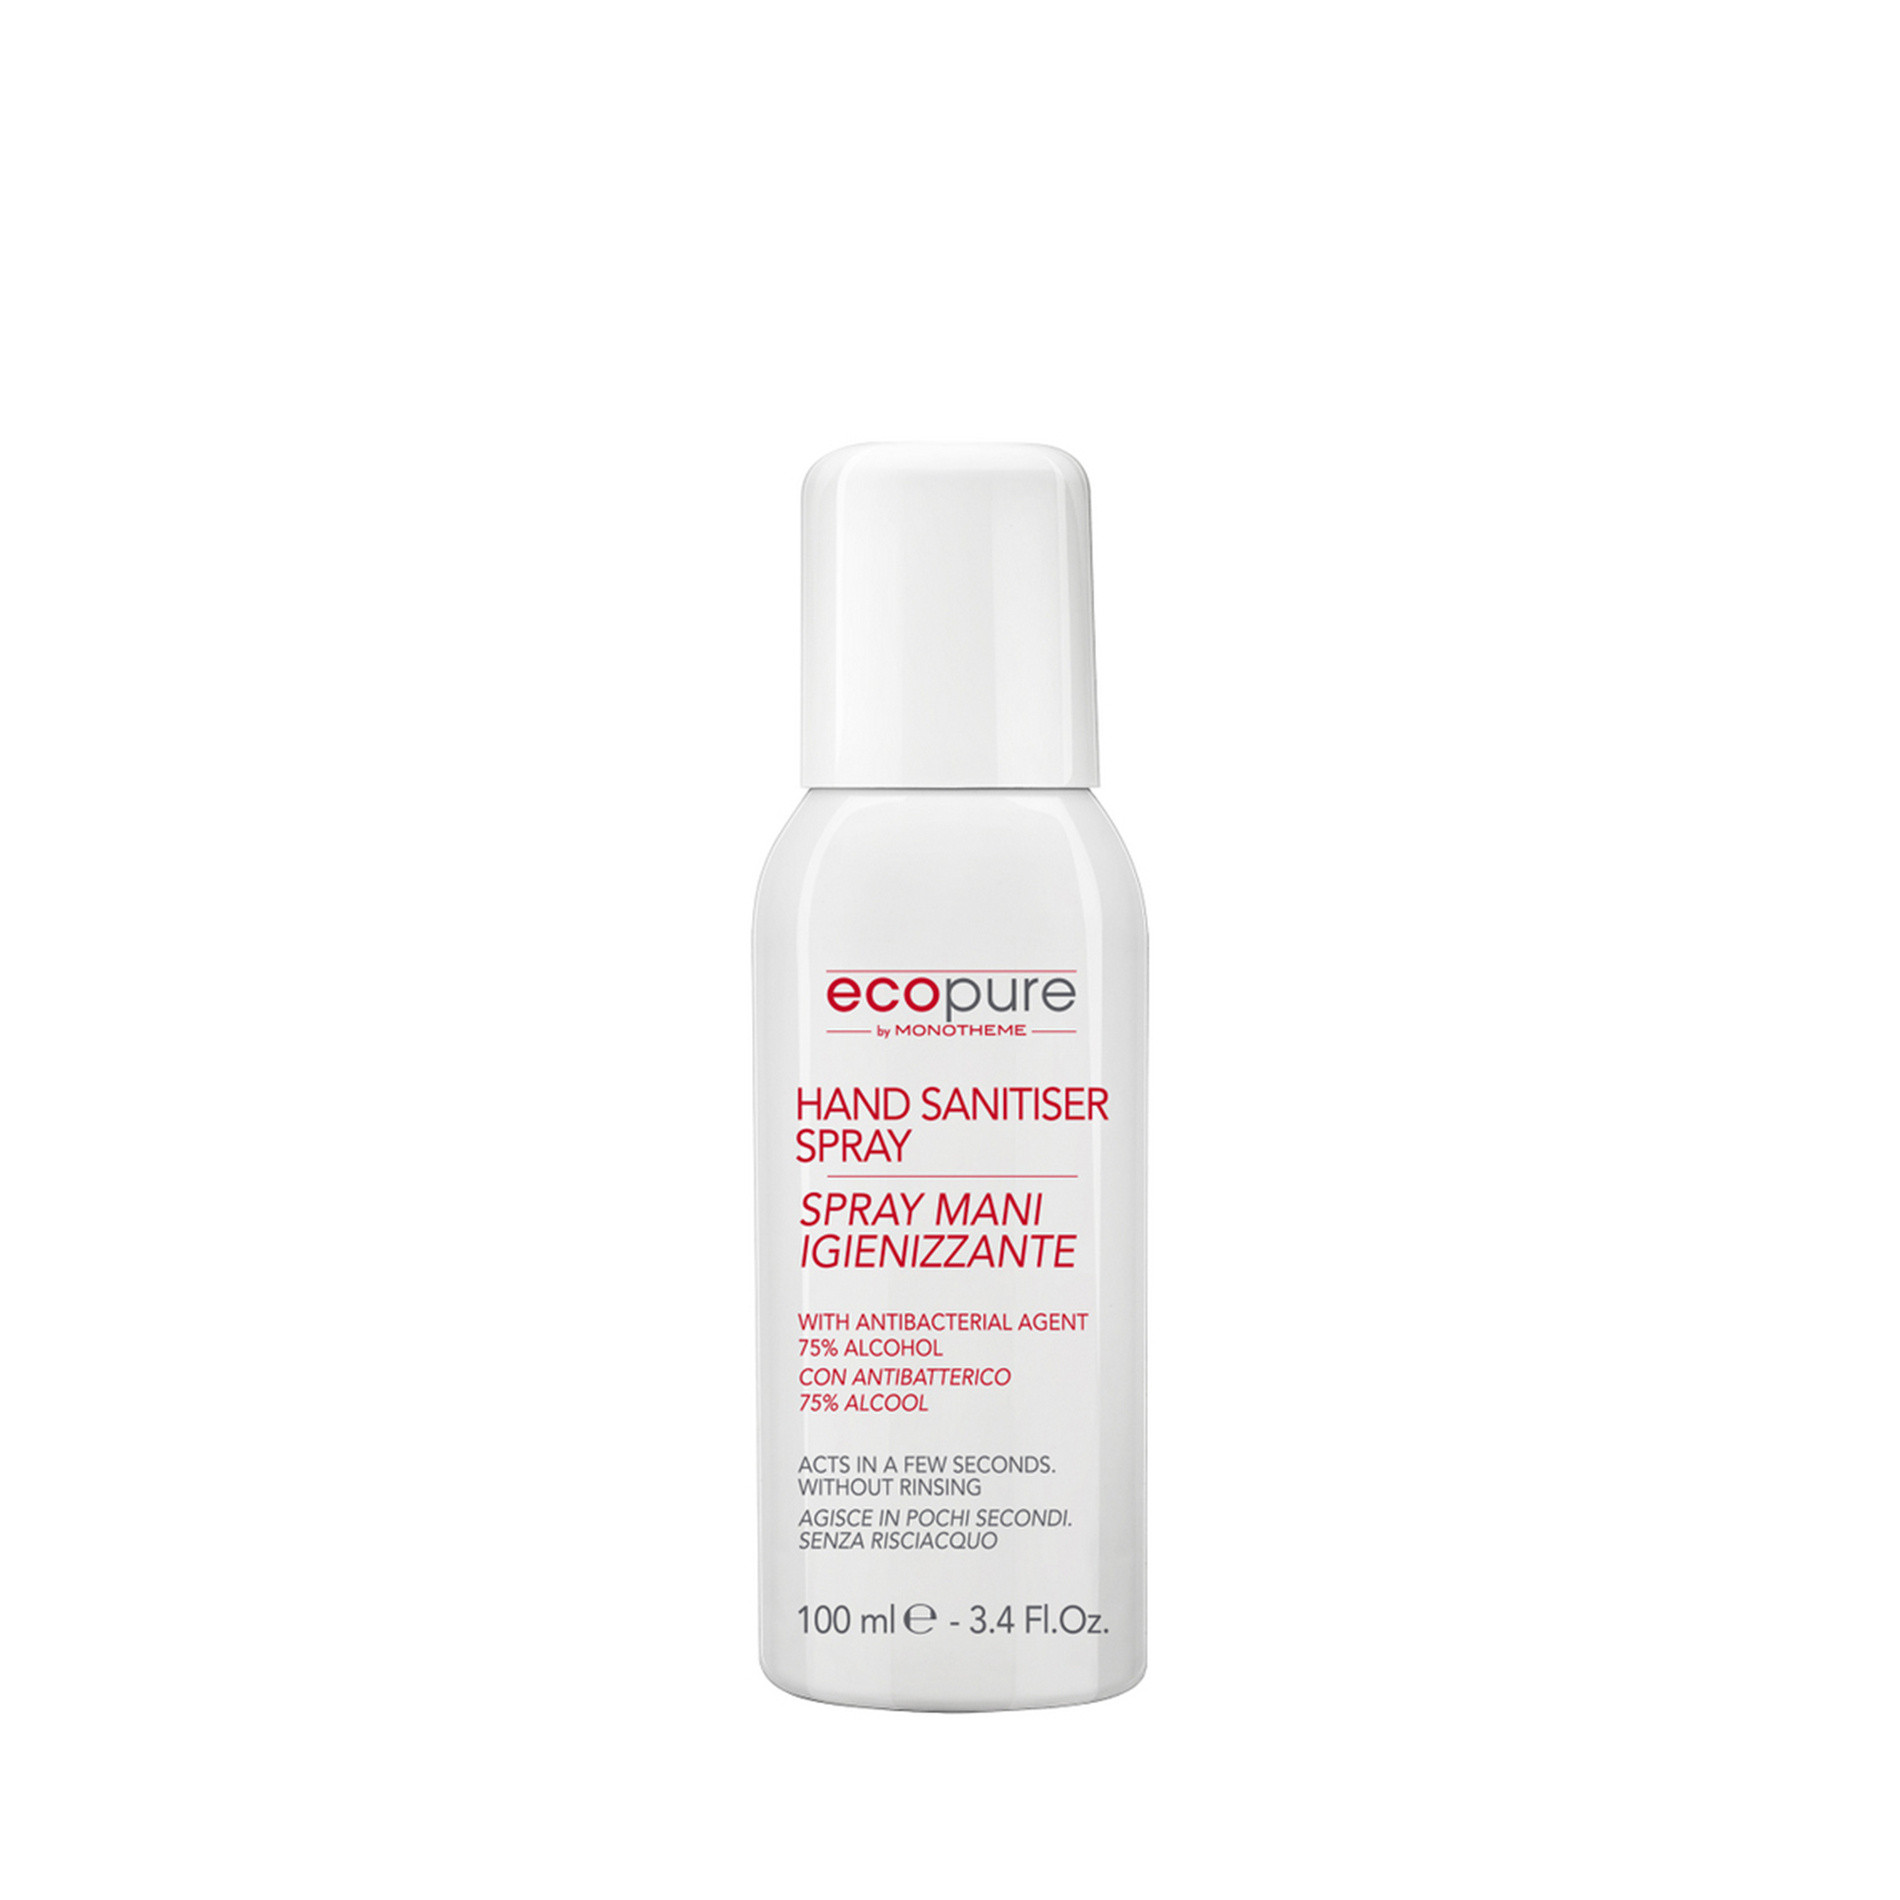 Spray igienizzante mani Ecopure by Monotheme 100ml, Trasparente, large image number 0